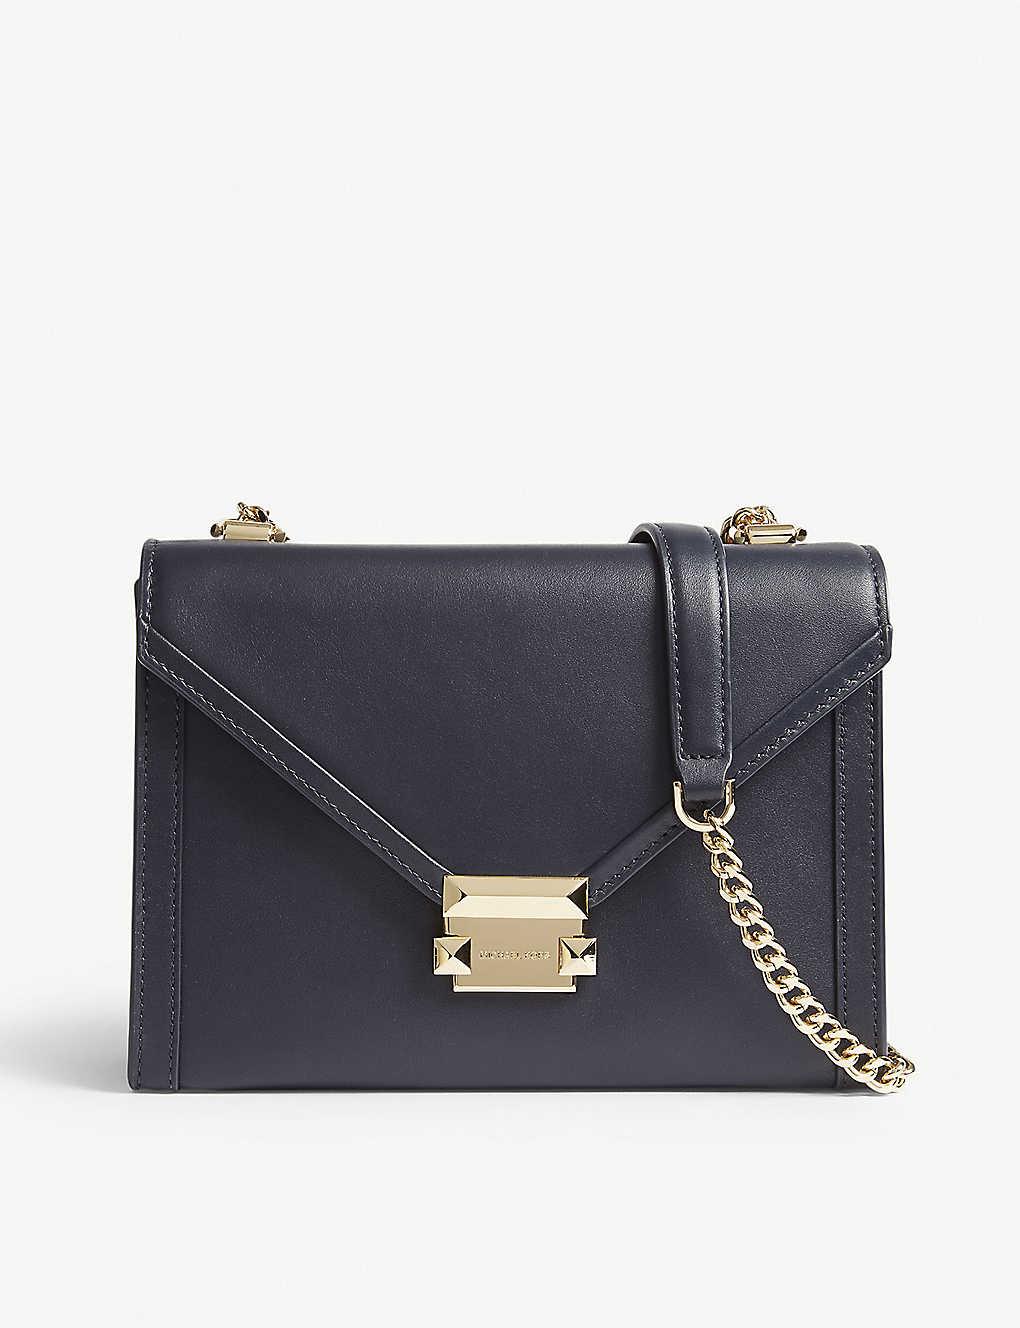 198db10c9 MICHAEL MICHAEL KORS - Whitney large leather shoulder bag ...